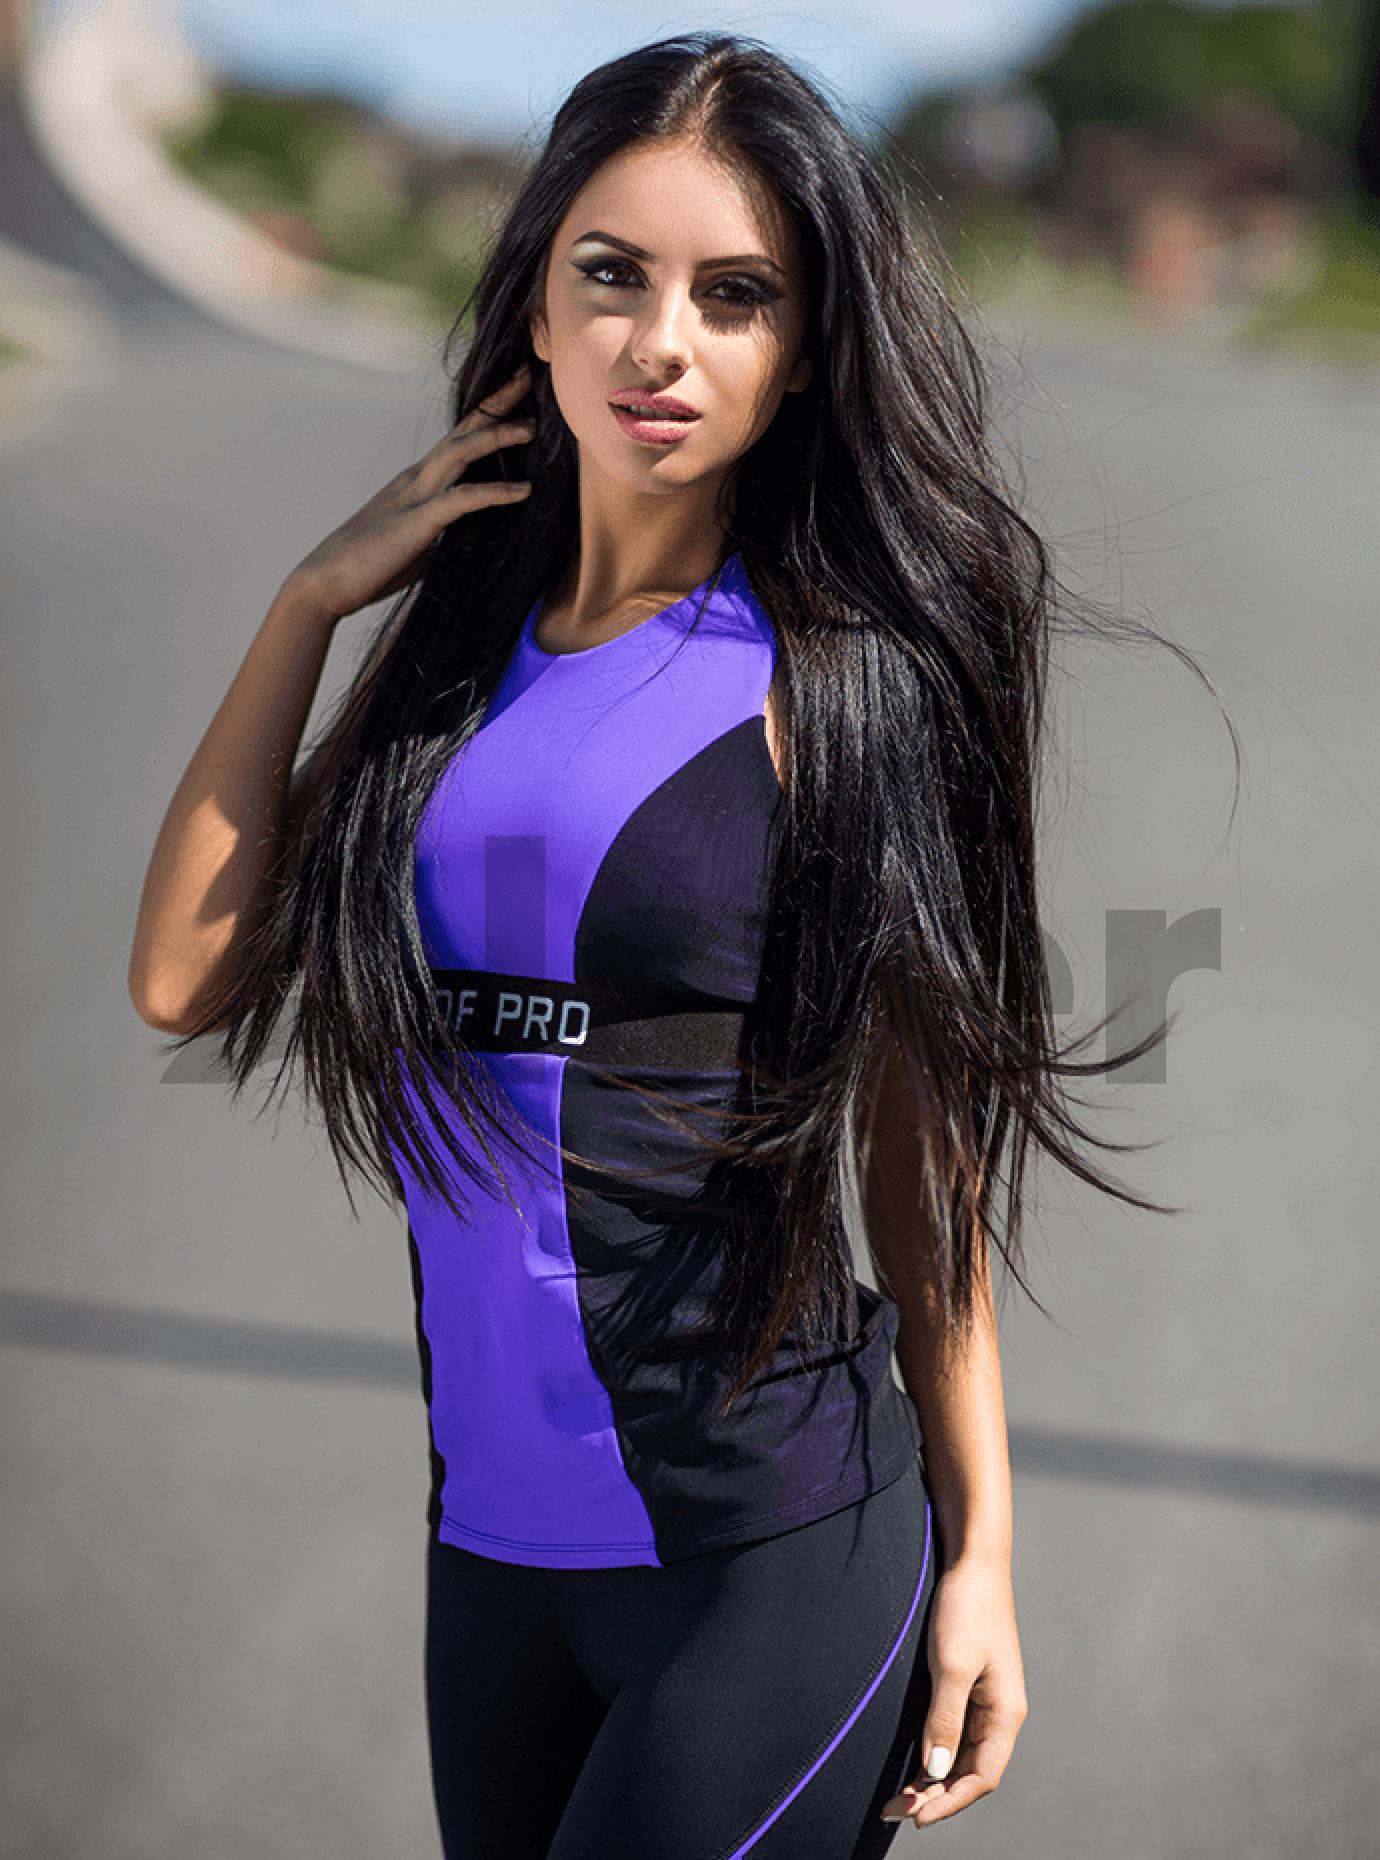 Топ женский Pro Violet Серый S (01-F171184): фото - Alster.ua